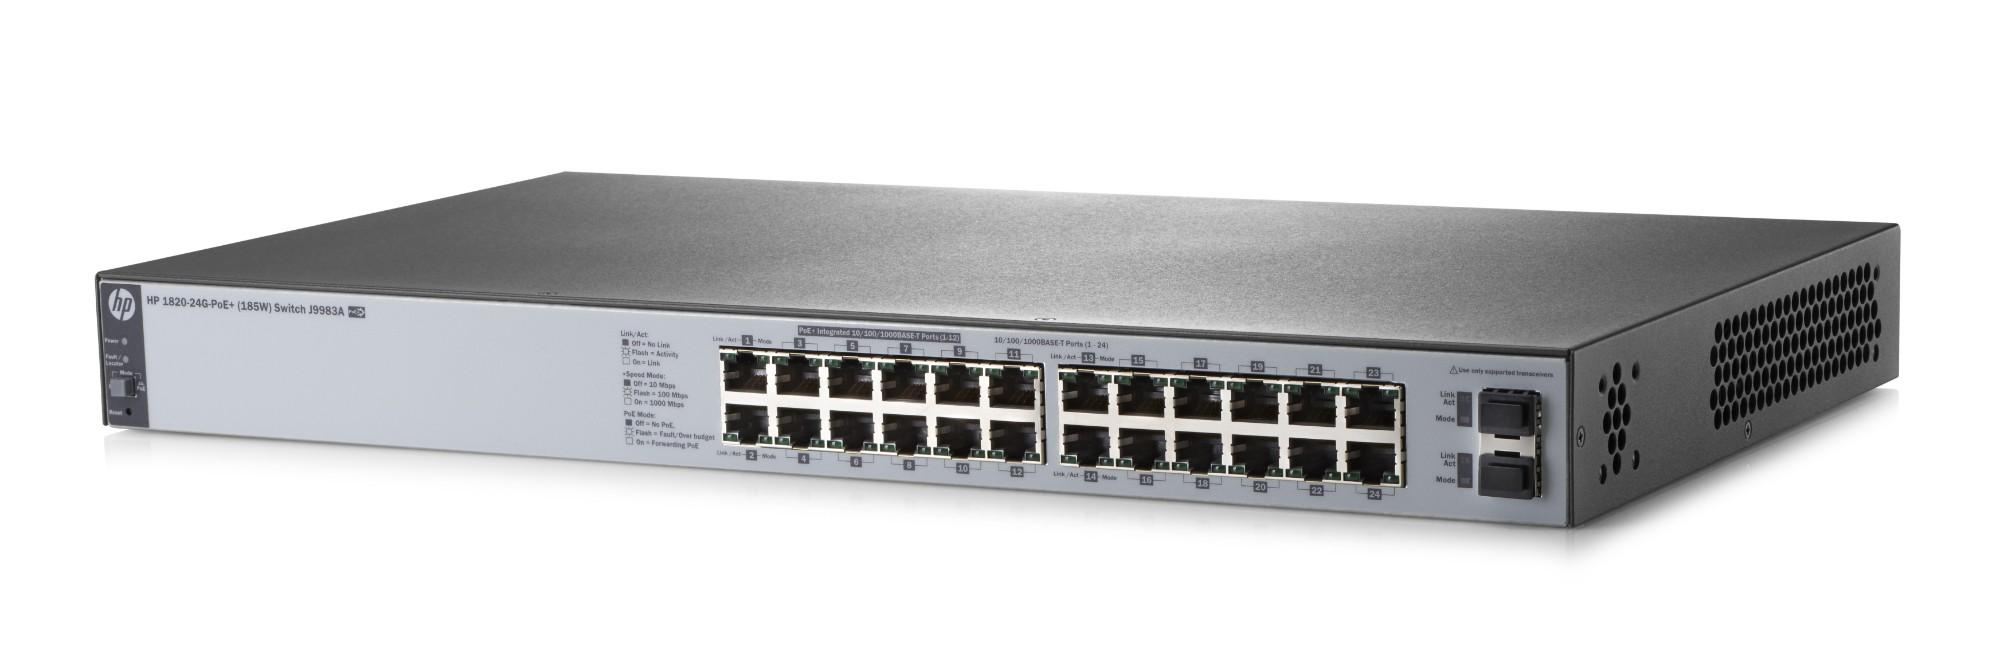 Hewlett Packard Enterprise 1820-24G-PoE+ (185W) Managed L2 Gigabit Ethernet (10/100/1000) Grey 1U Power over Ethernet (PoE)